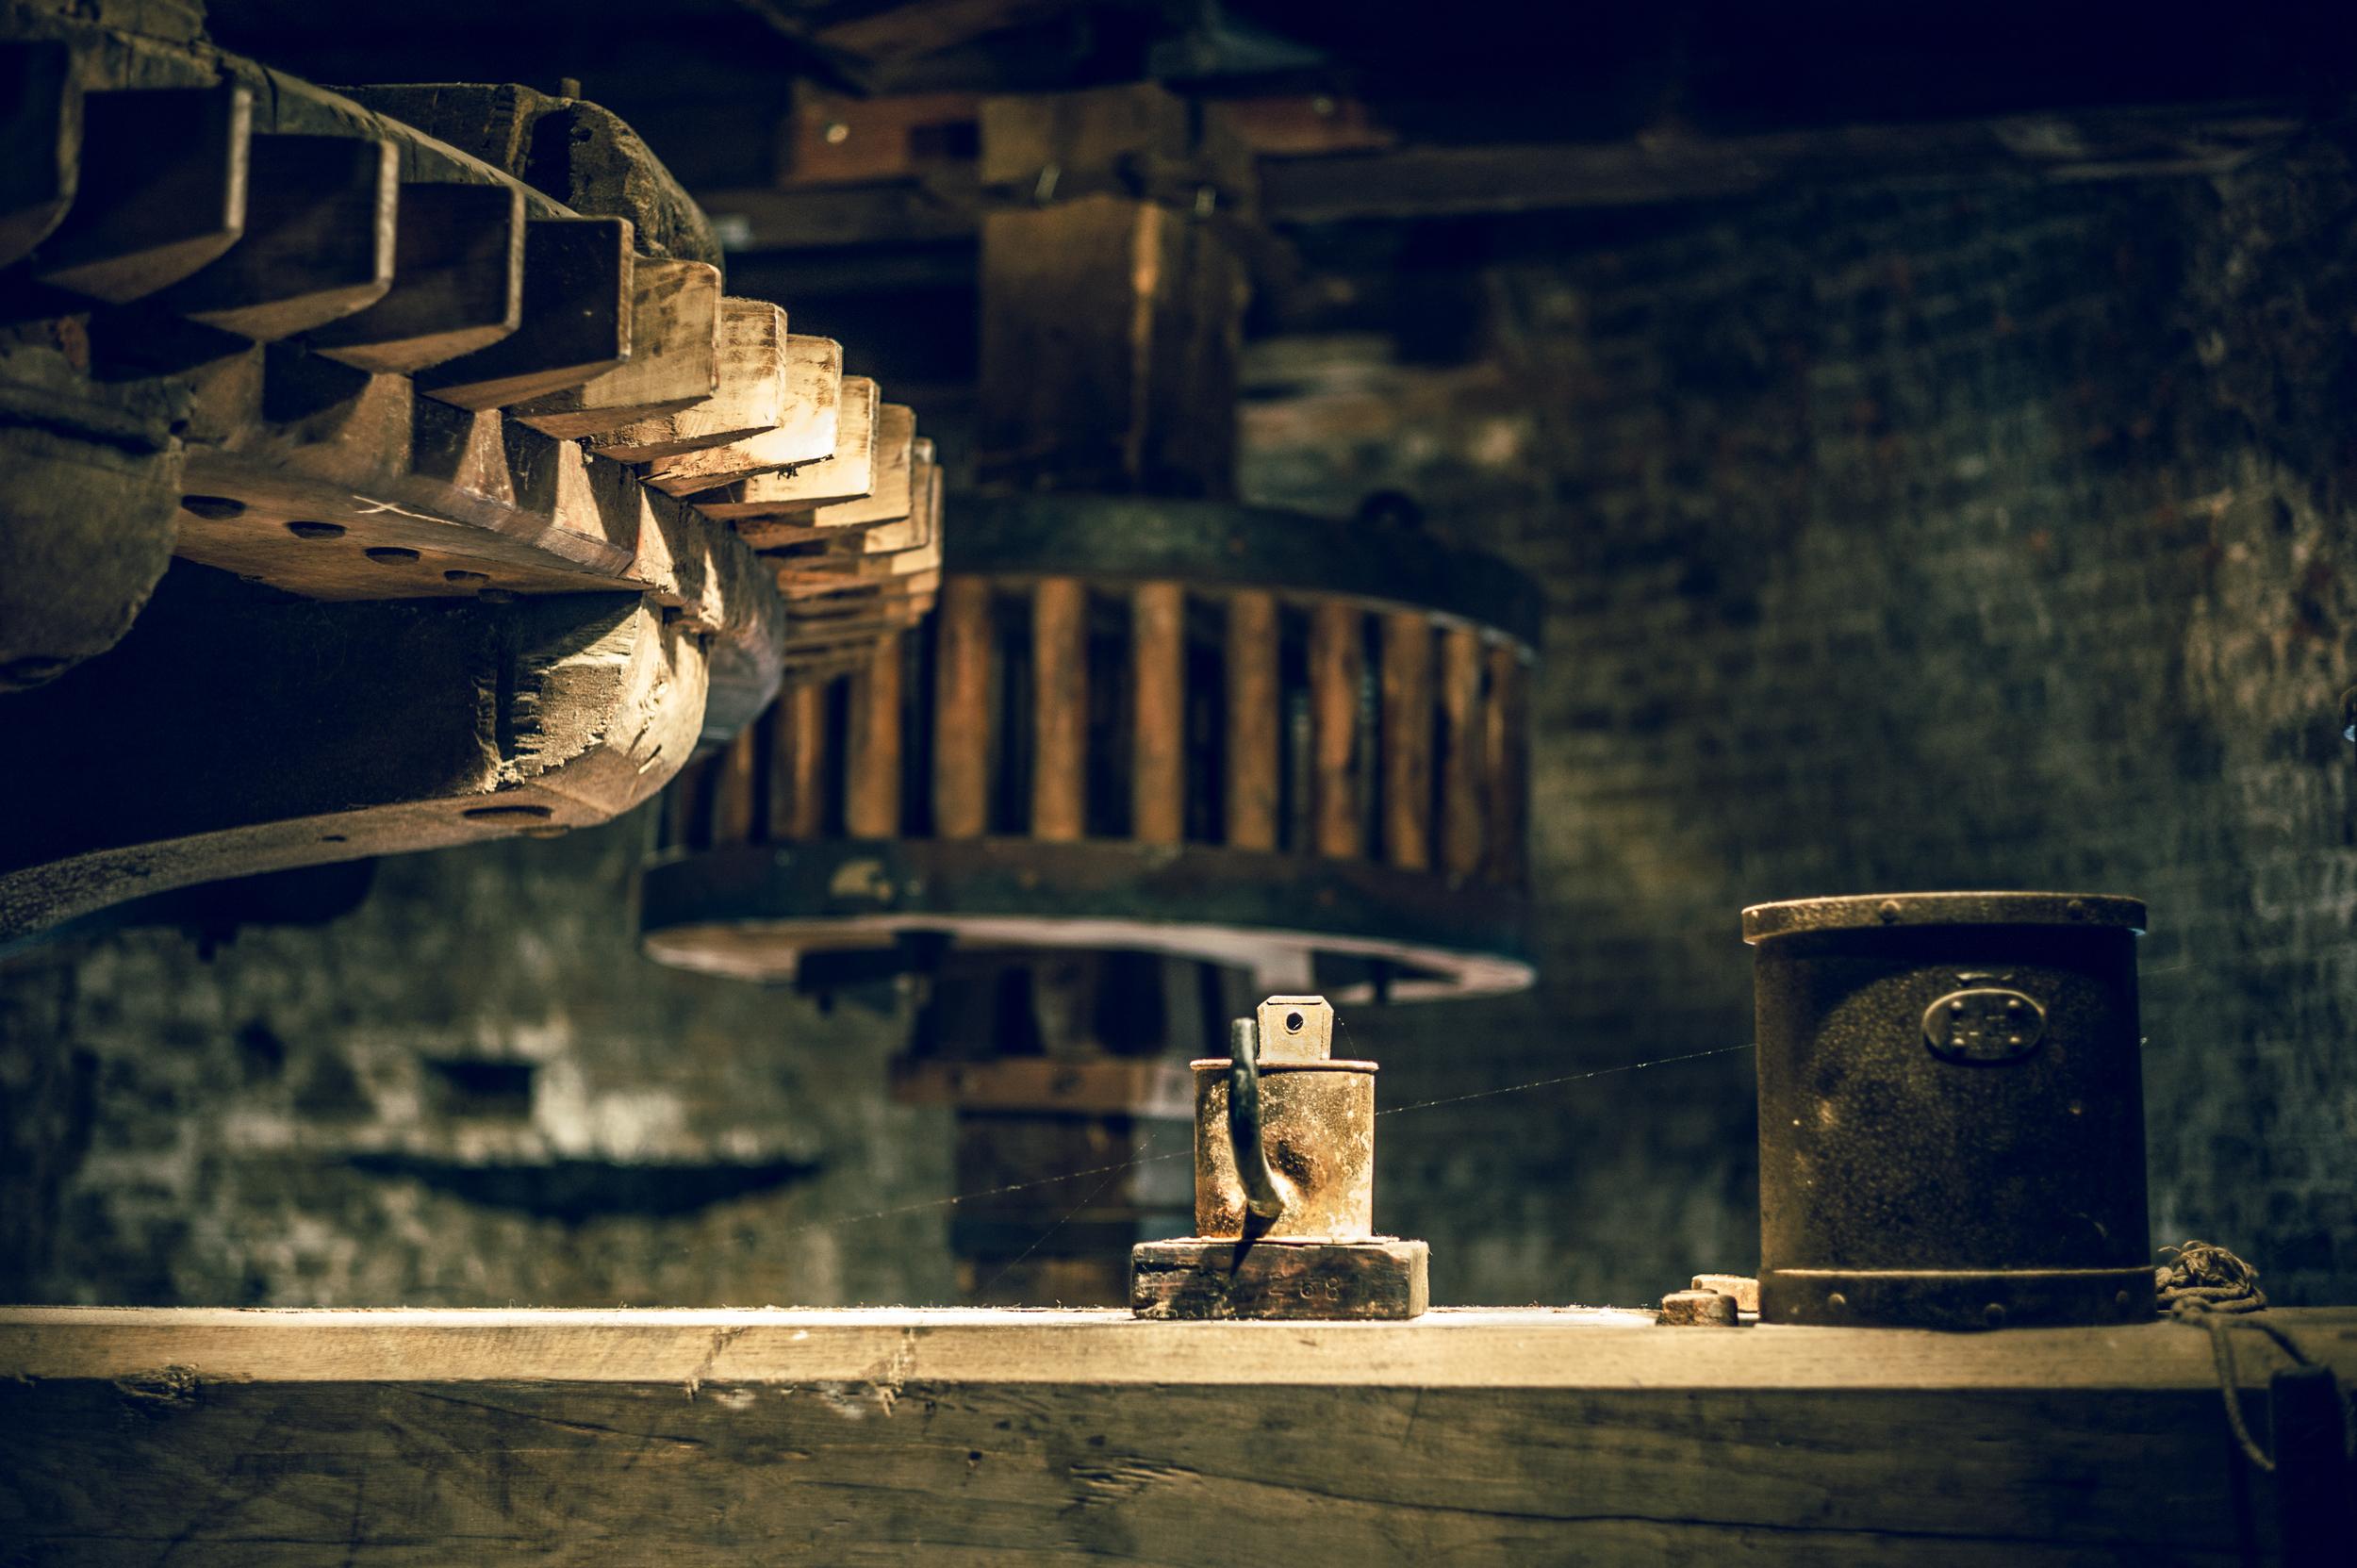 Dutch Windmill Gears